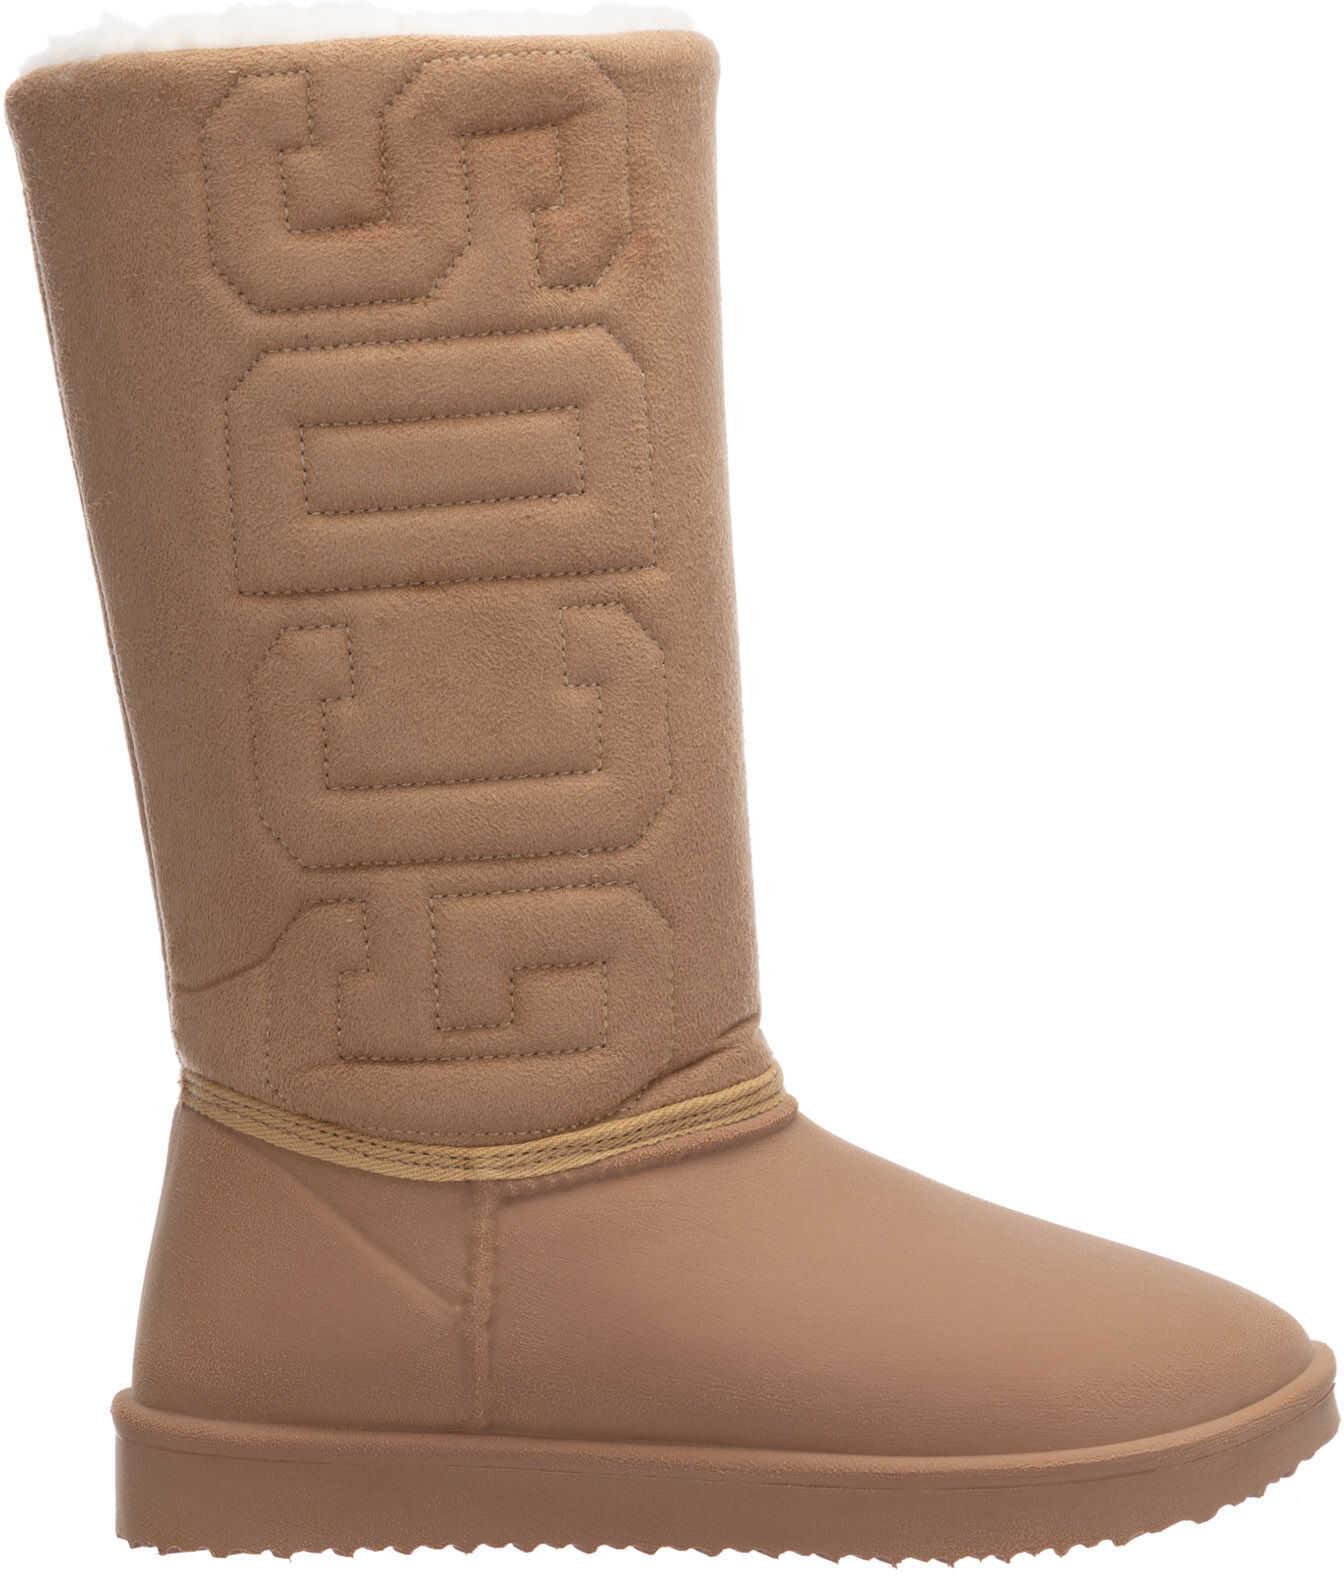 GCDS Boots Booties FW21W010098-13 Beige imagine b-mall.ro